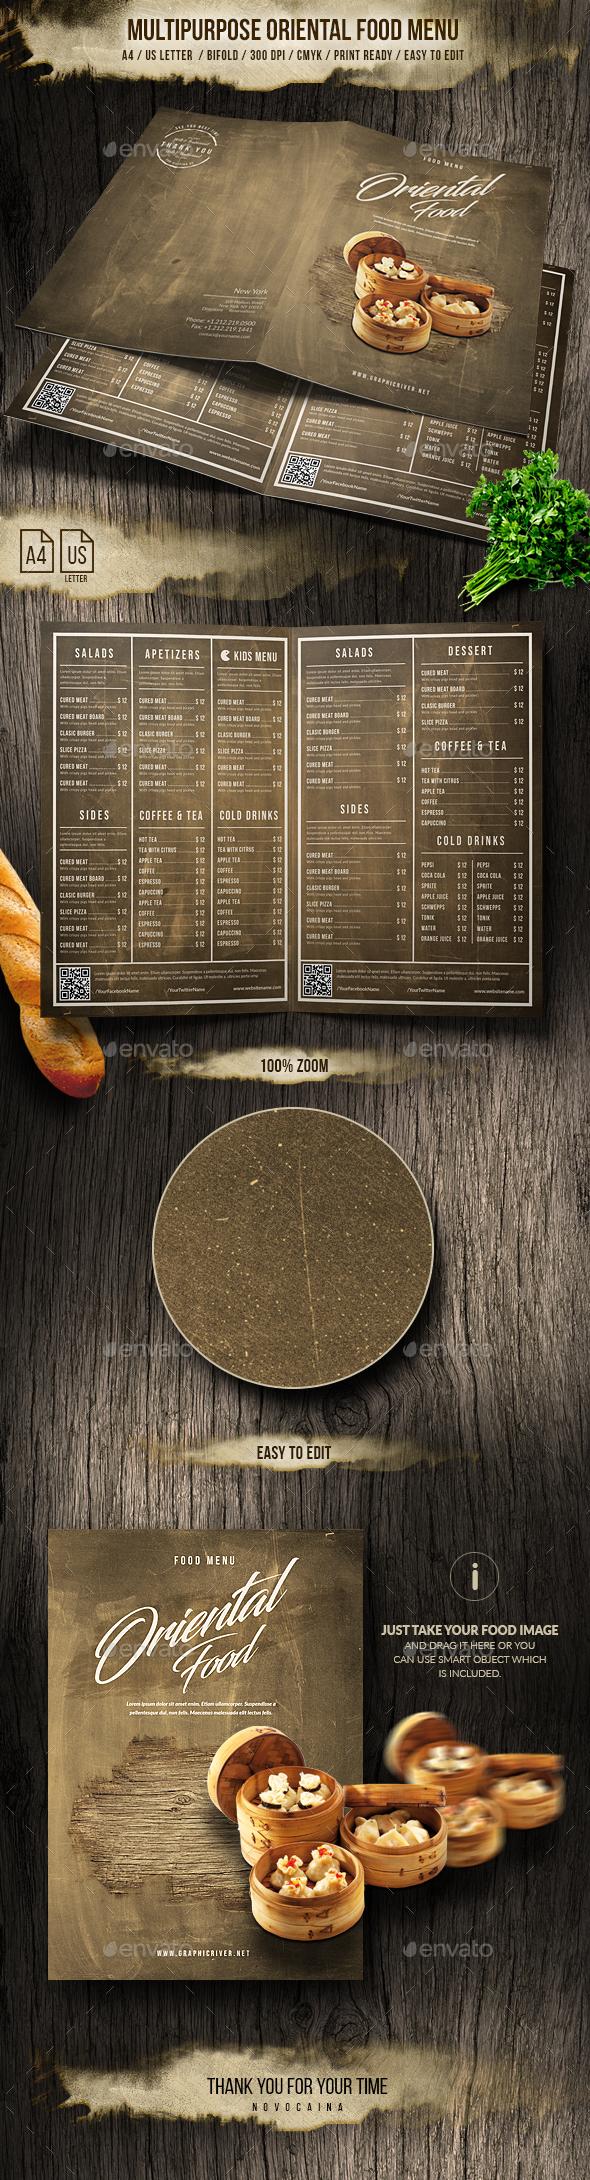 Multipurpose Oriental Bifold Menu - A4 & US Letter - Food Menus Print Templates